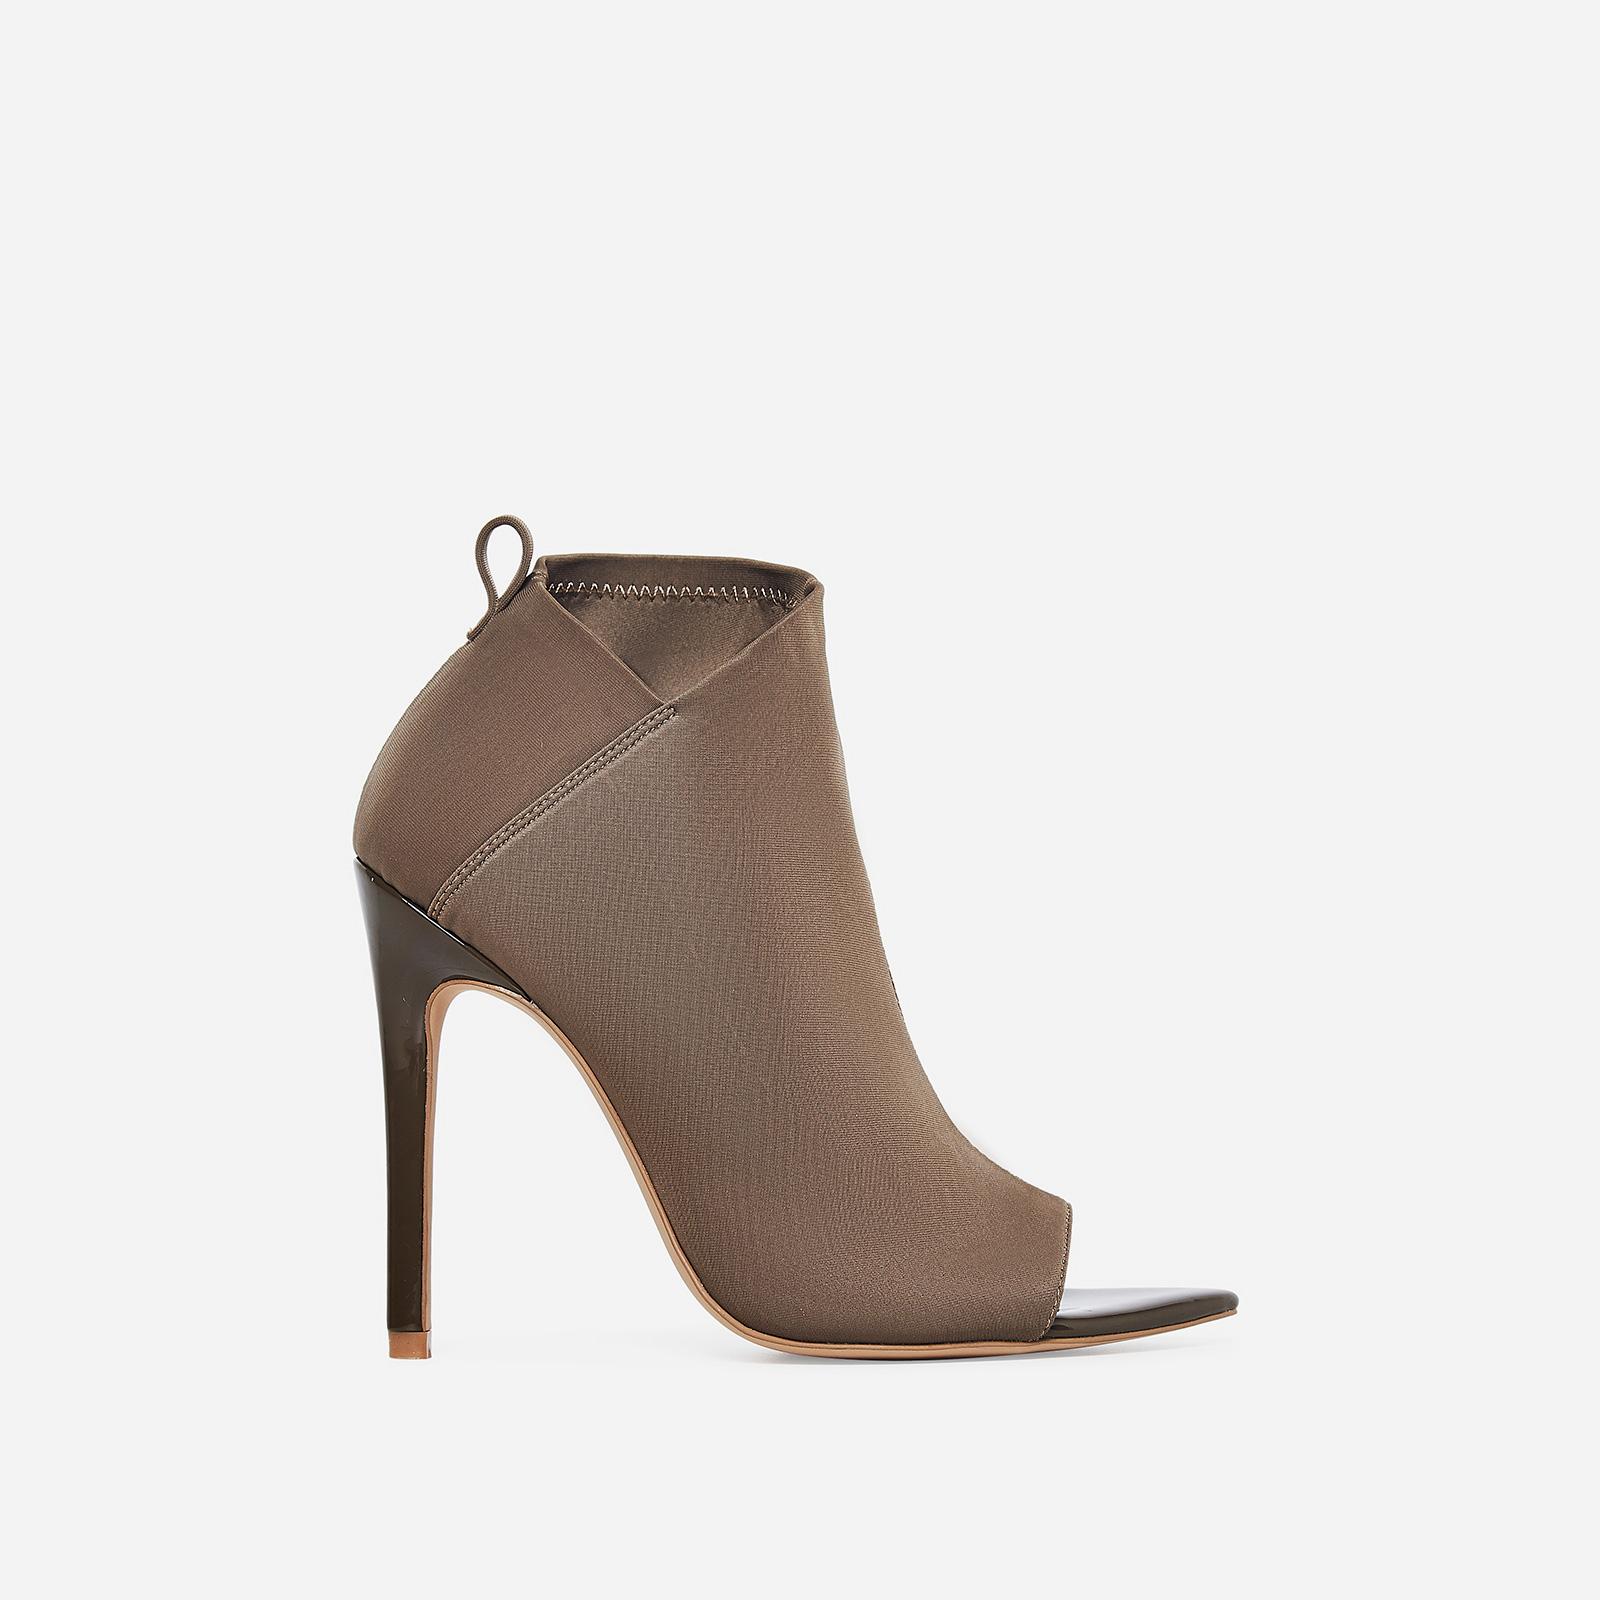 Silva Pointed Peep Toe Ankle Sock Boot In Khaki Lycra